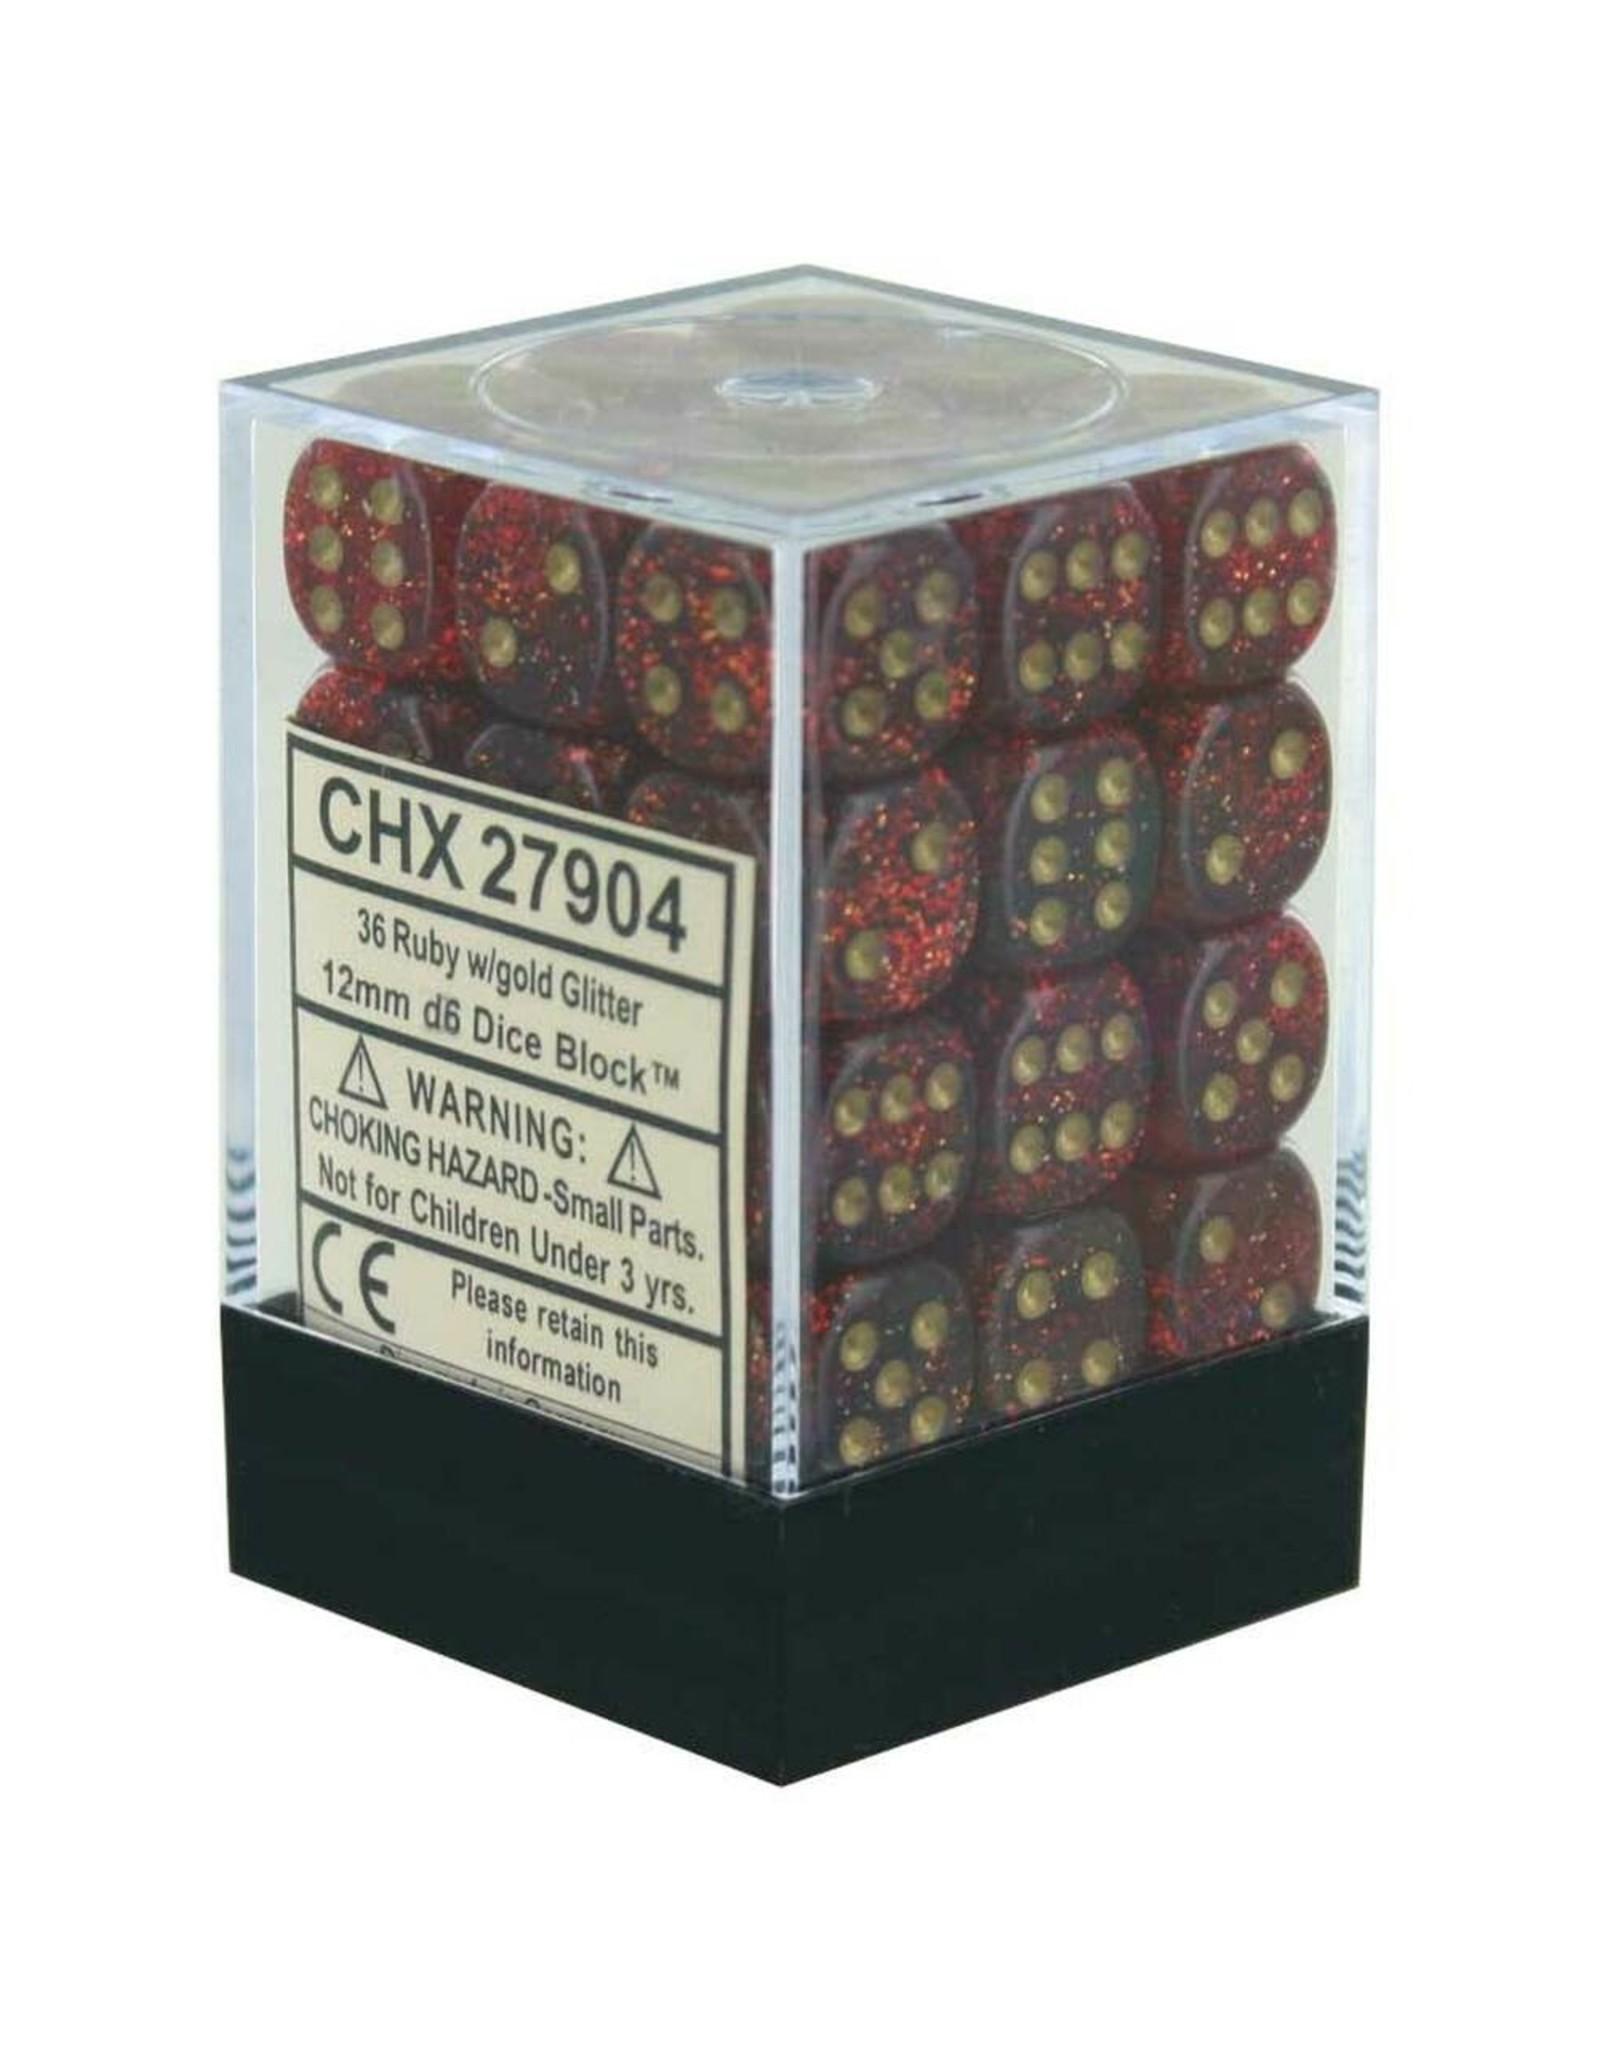 CHESSEX CHX 27904 12MM DICE BLOCK GLITTER RUBY W/GOLD